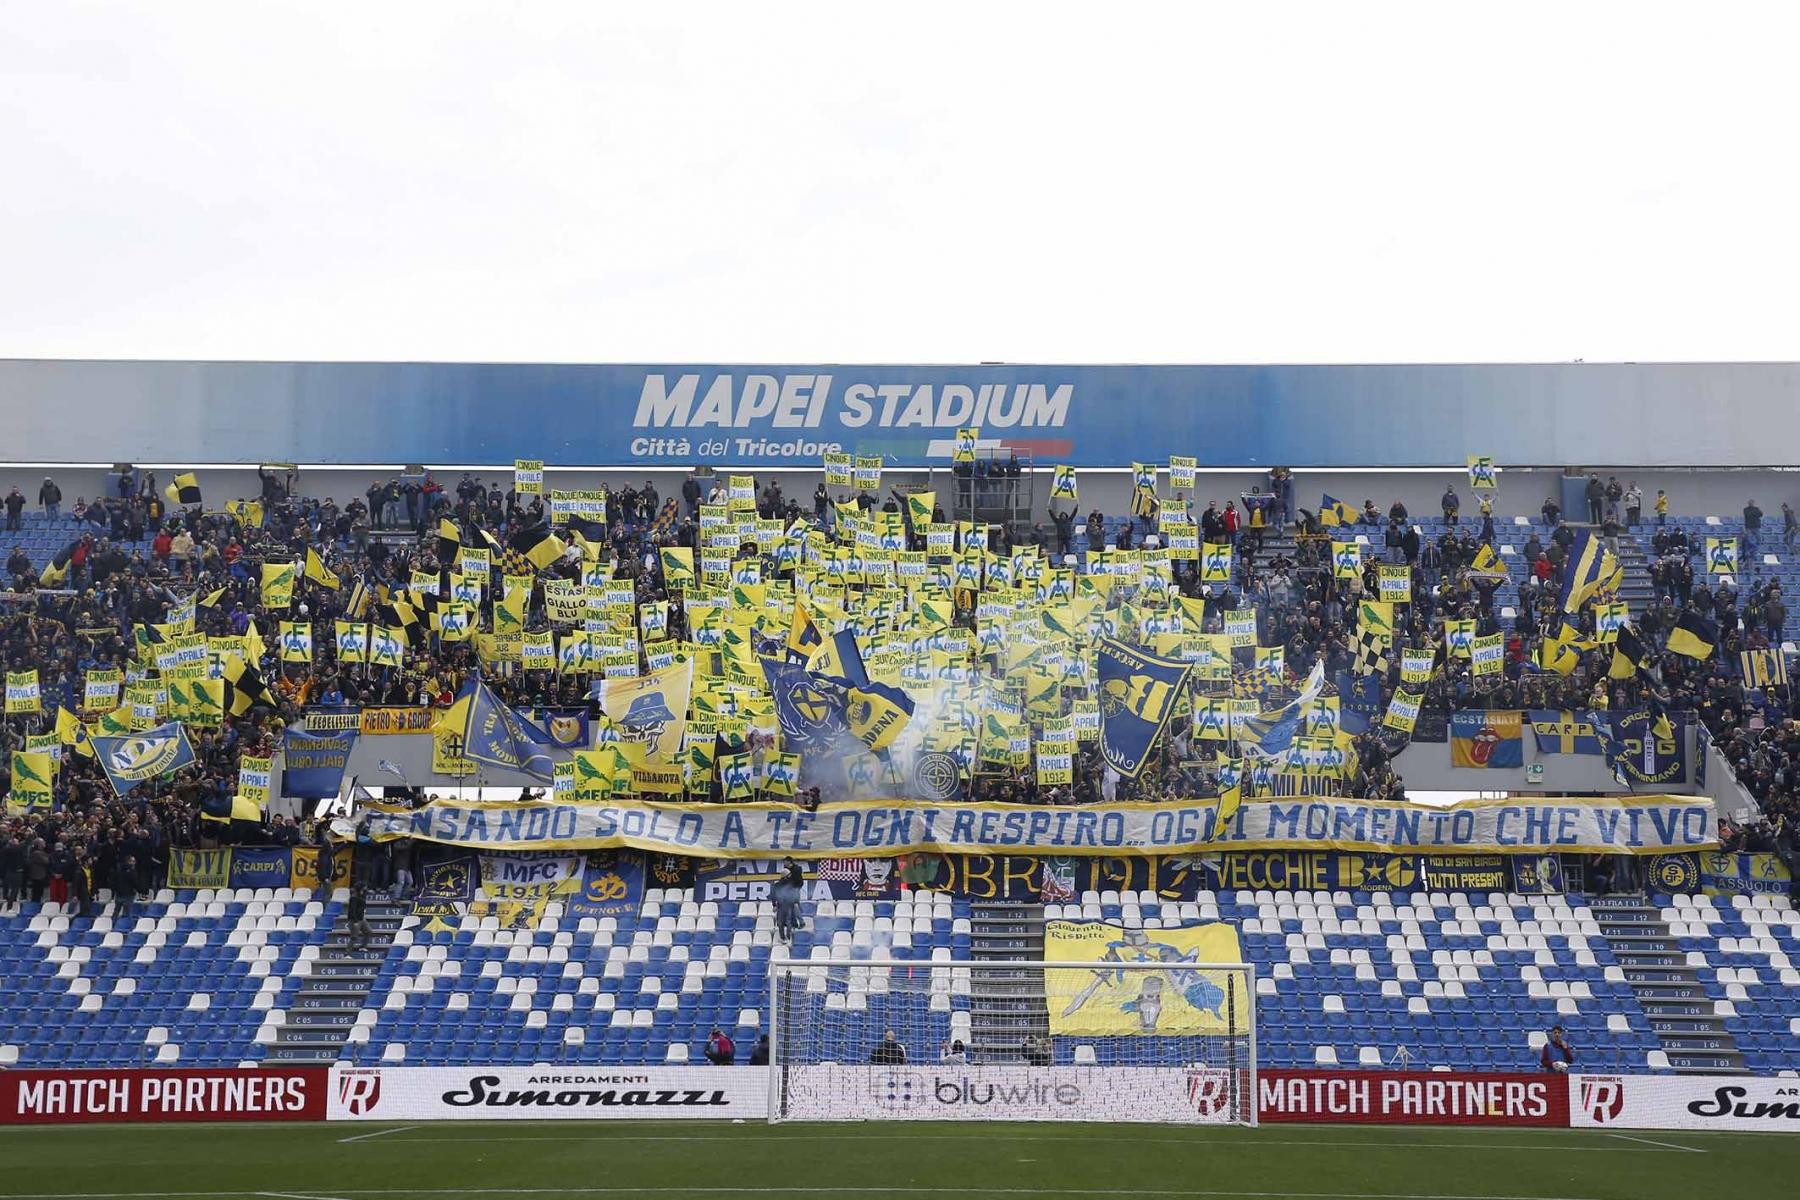 reggiana-modena-reggio-audace-derby-7-4-2019-8.jpg